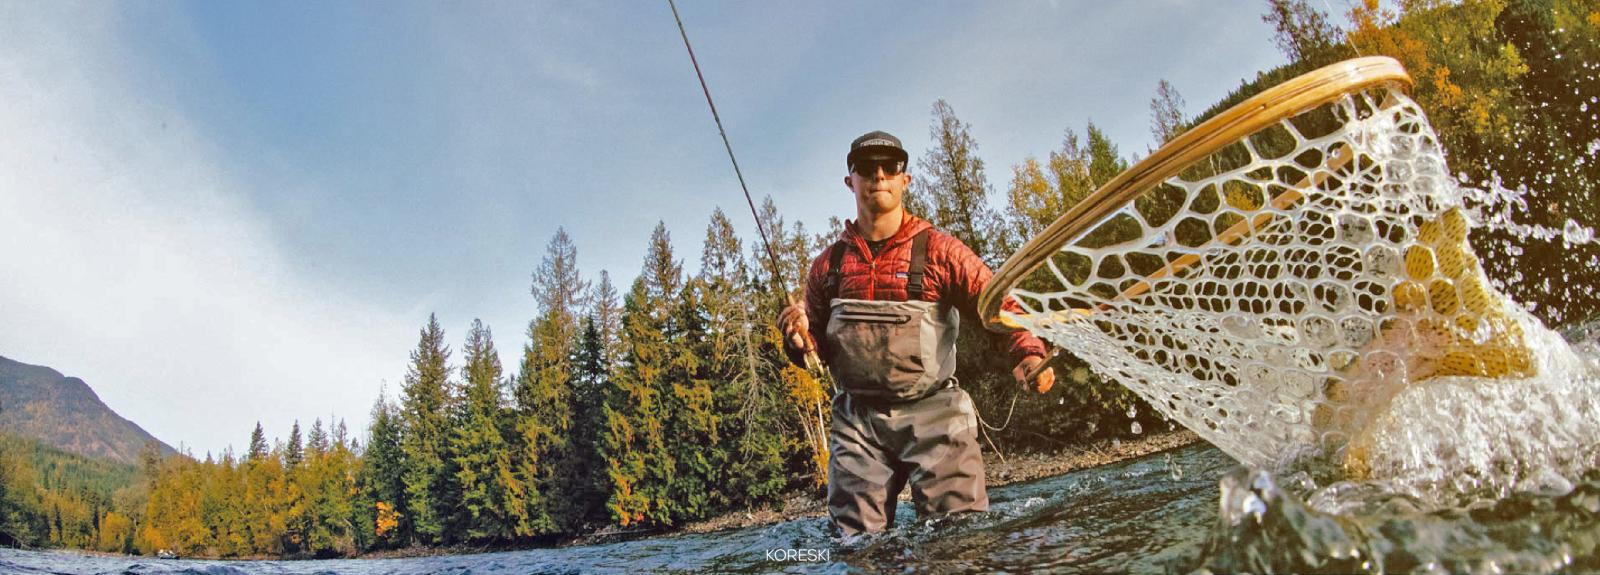 Fishing in Kamloops British Columbia